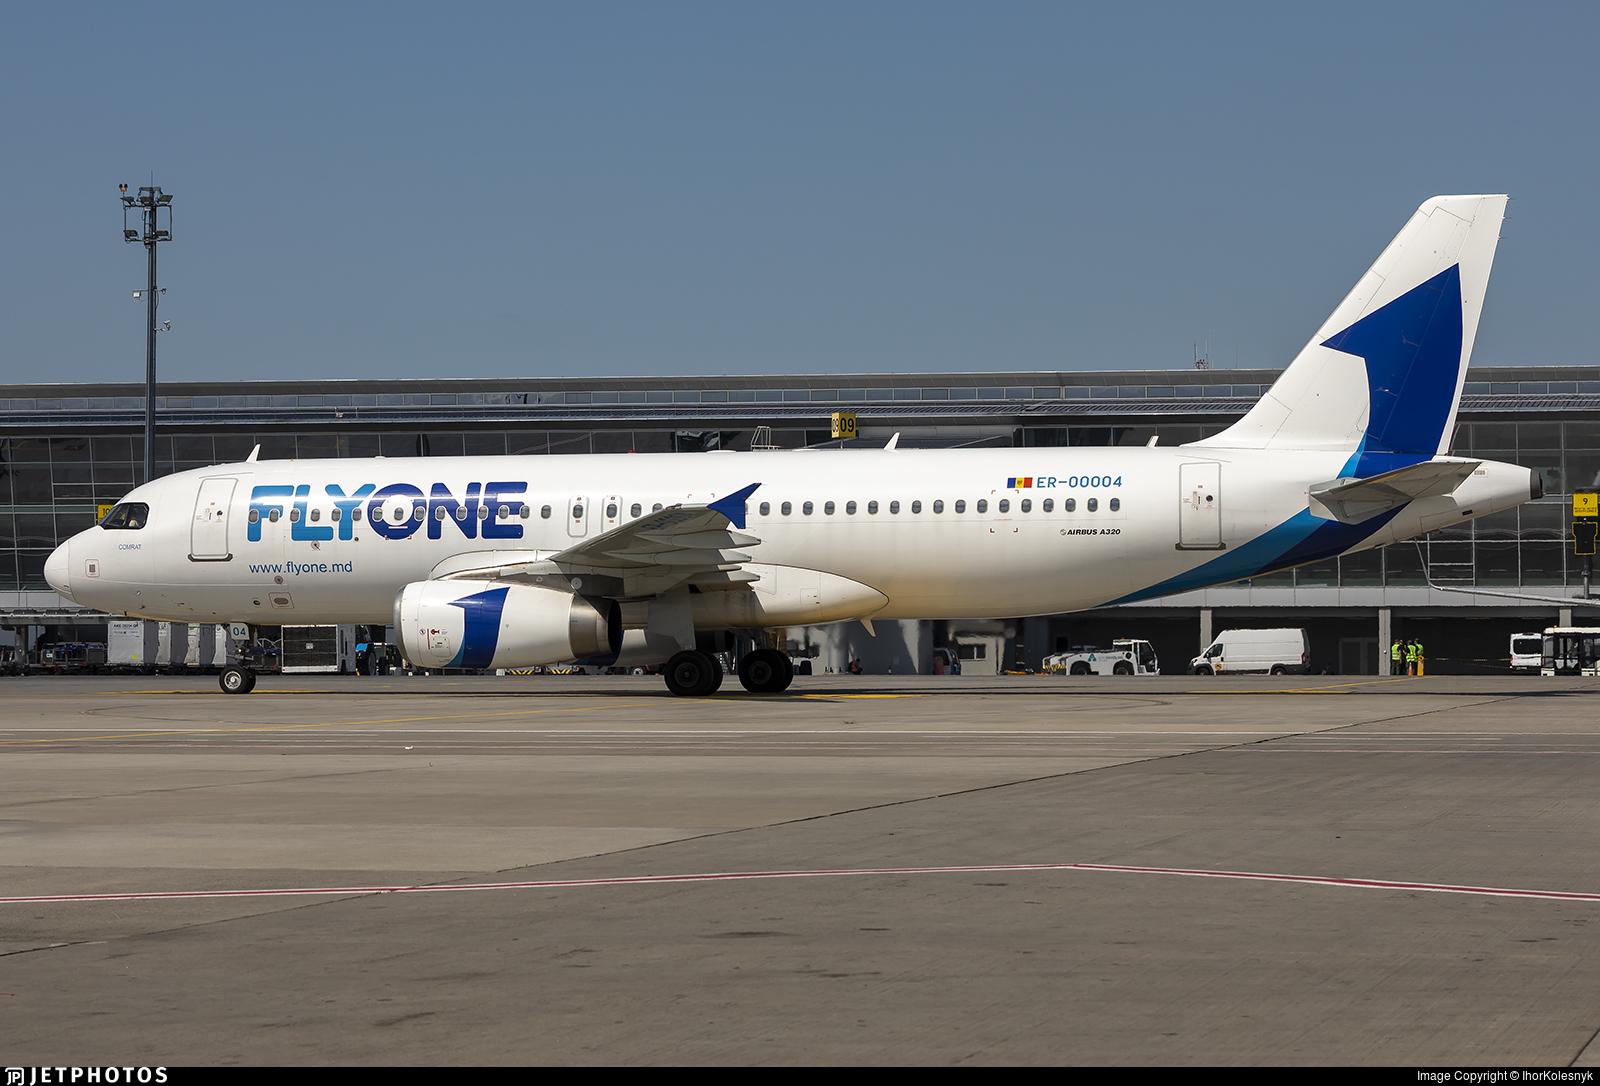 ER-00004 - Airbus A320-233 - FlyOne